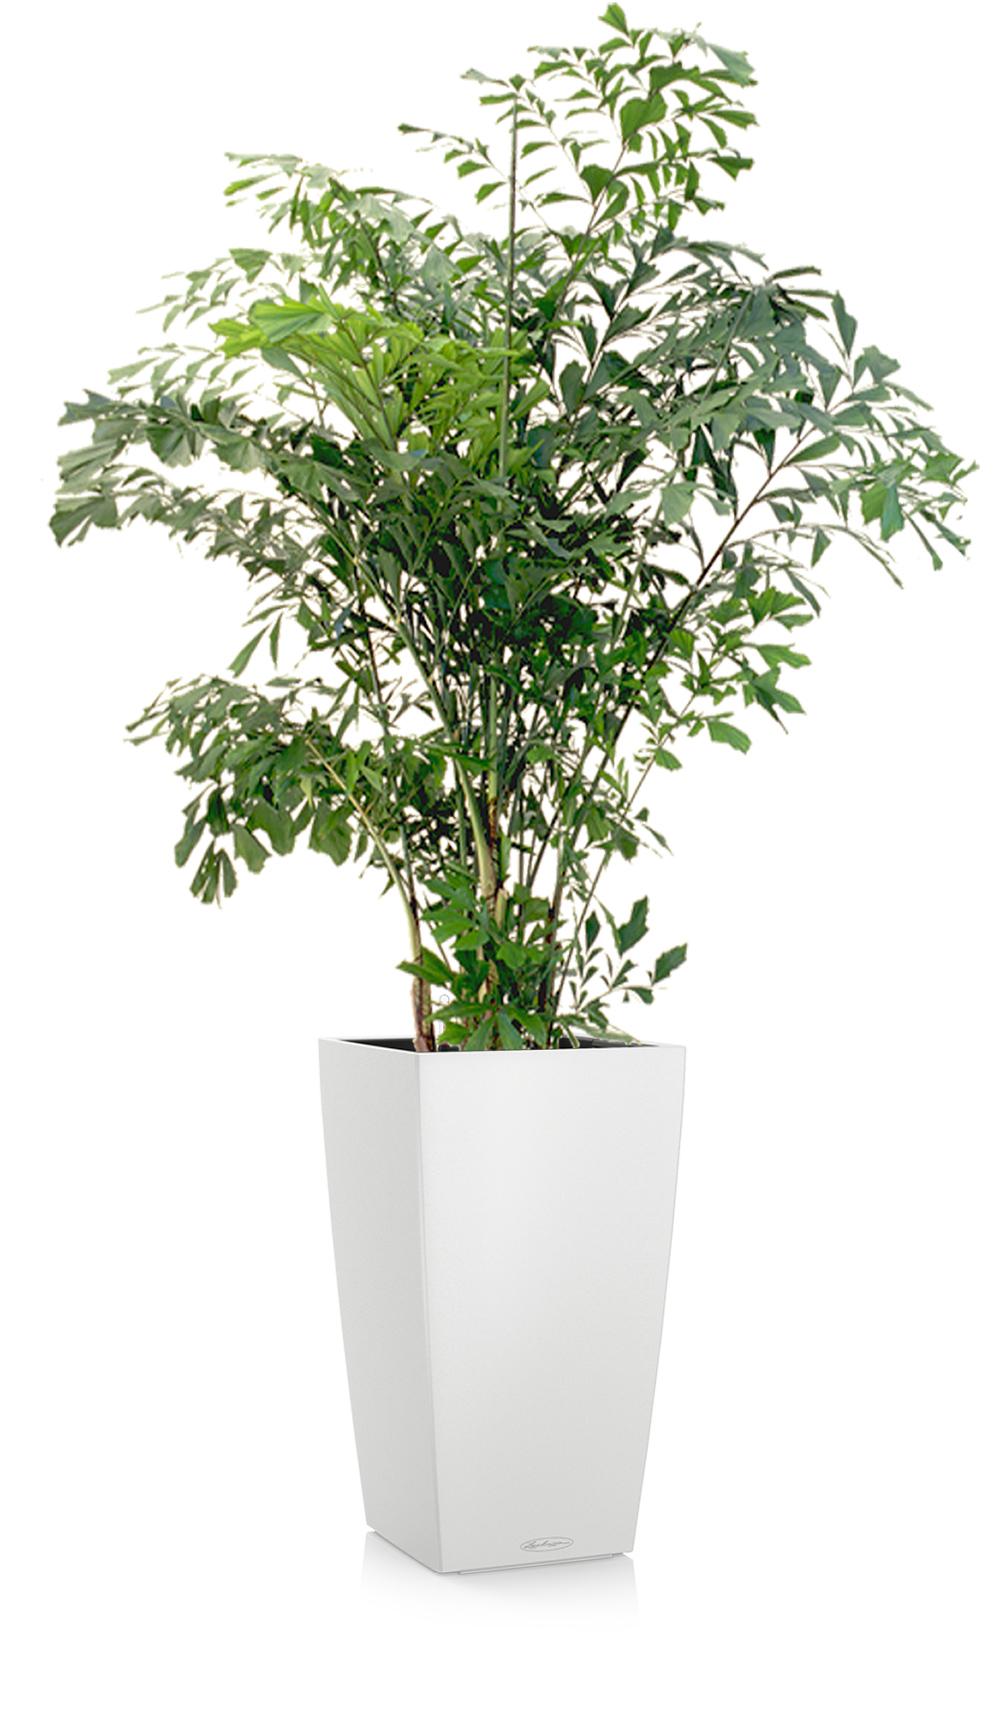 greenleaf_medhigh light_fishtail palm